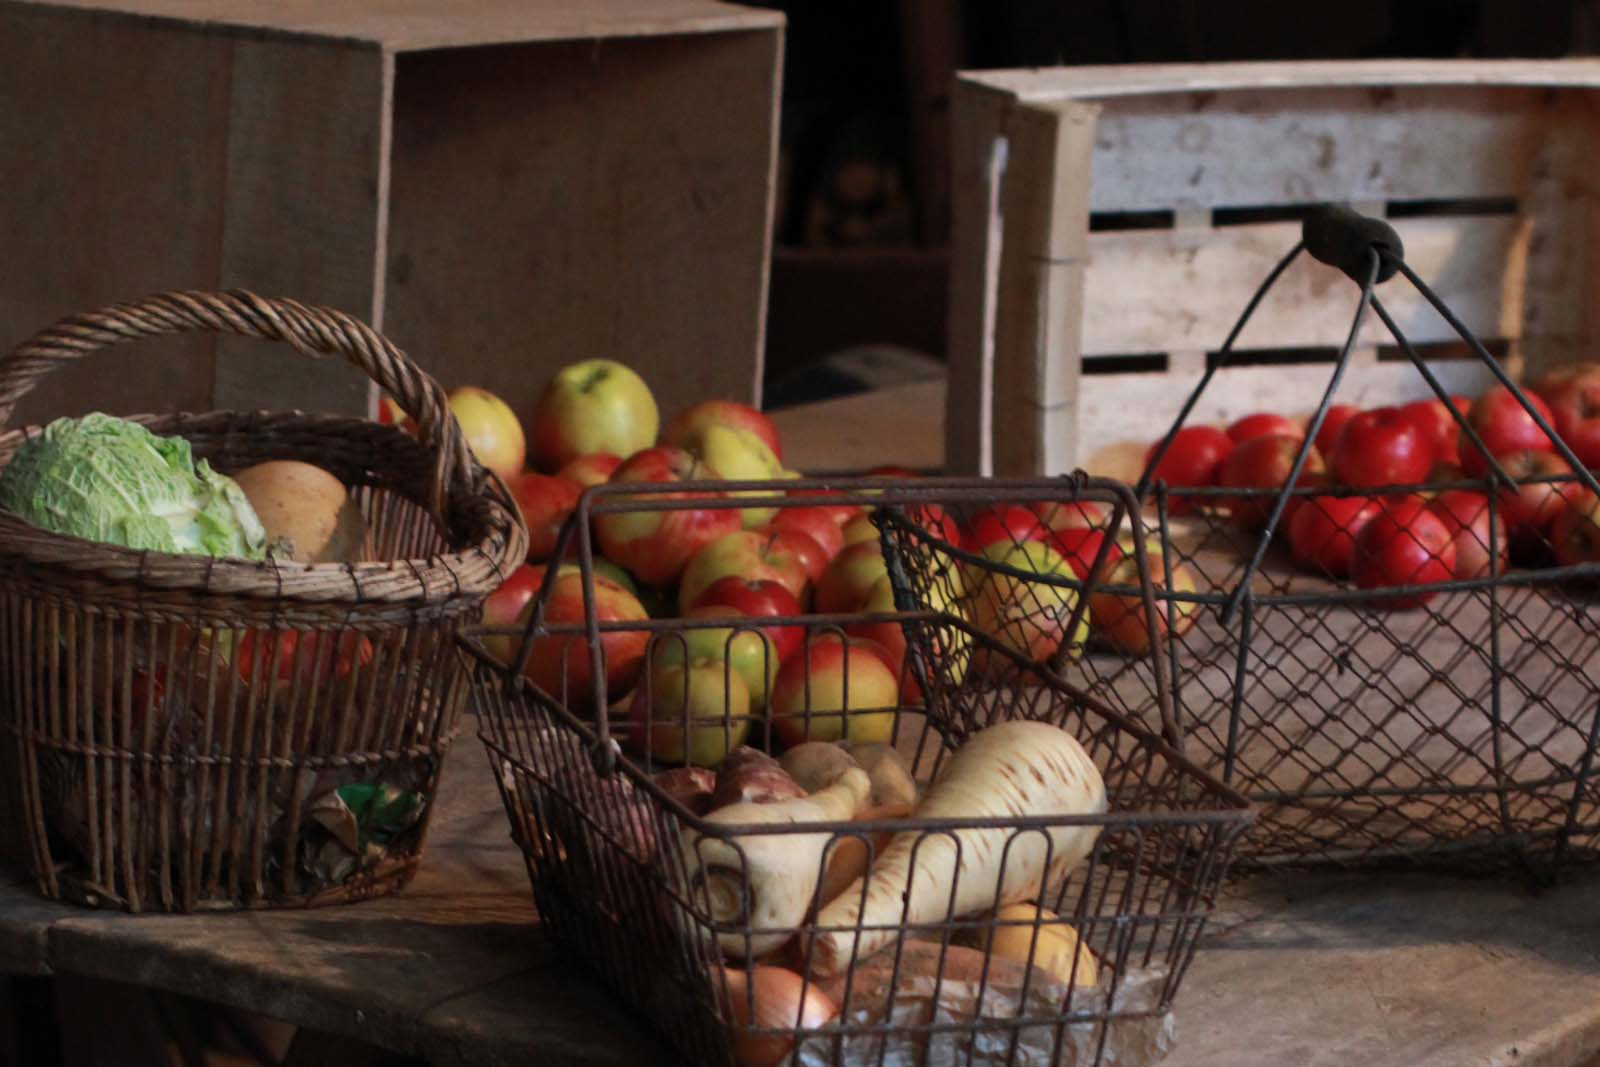 anne-thierry-herbergement-legumesgrange-maison paulette